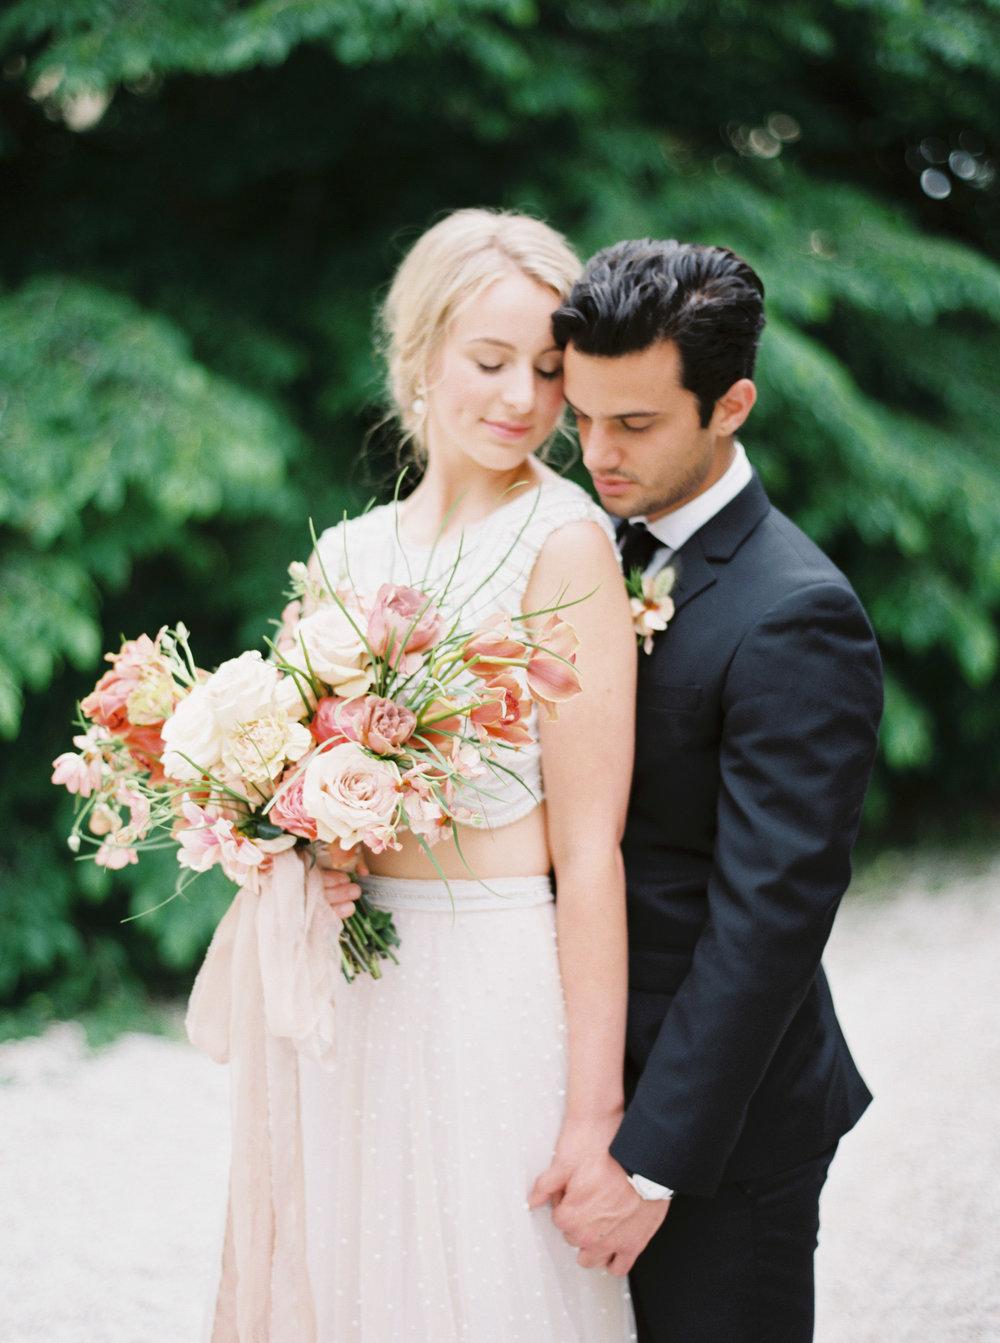 Timeless Southern Highland Wedding Elopement in Bowral NSW Fine Art Film Photographer Sheri McMahon-36.jpg